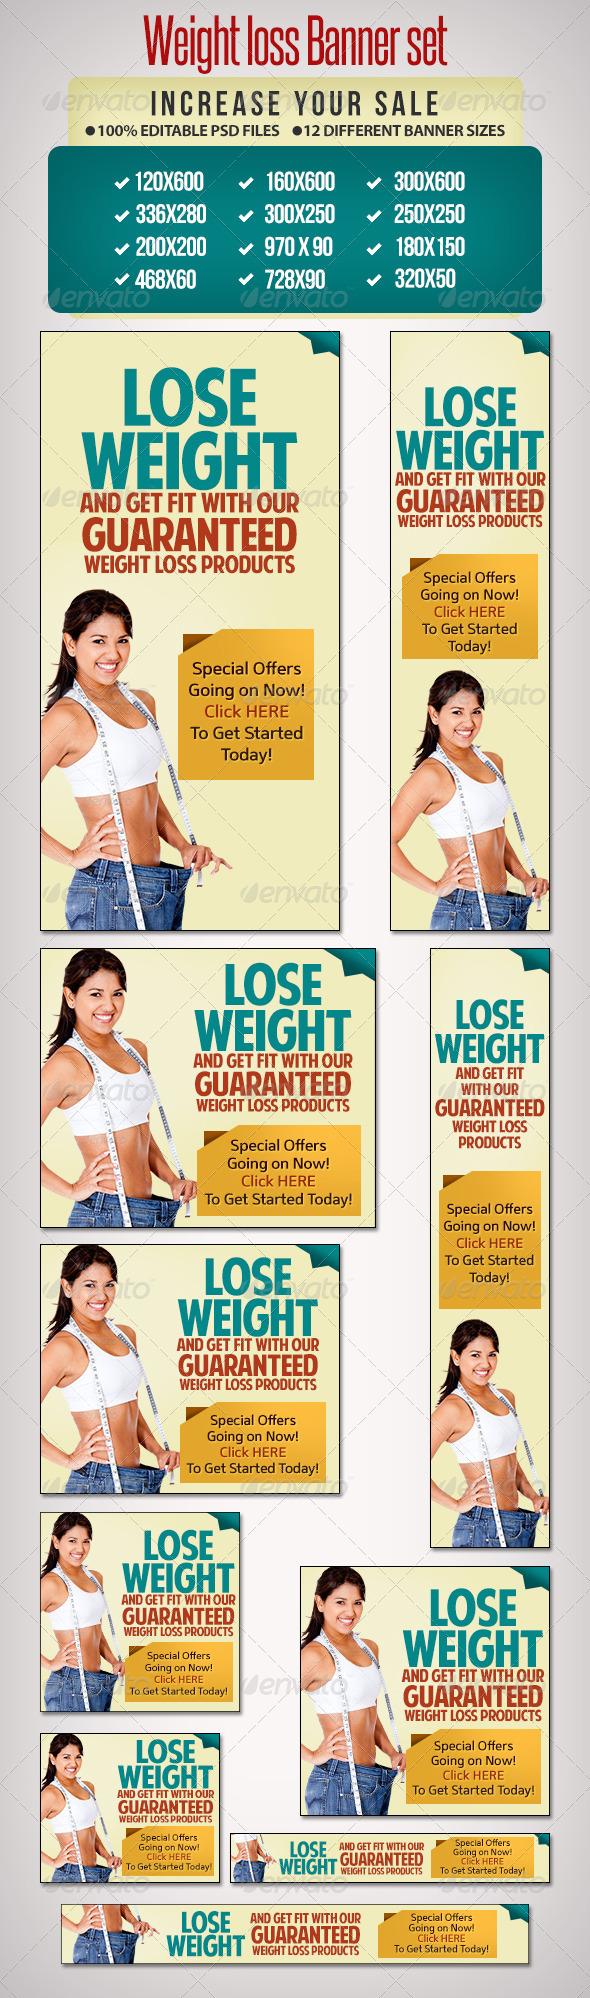 GraphicRiver Weightloss Banner Set 4 12 Google Standard Sizes 6523033